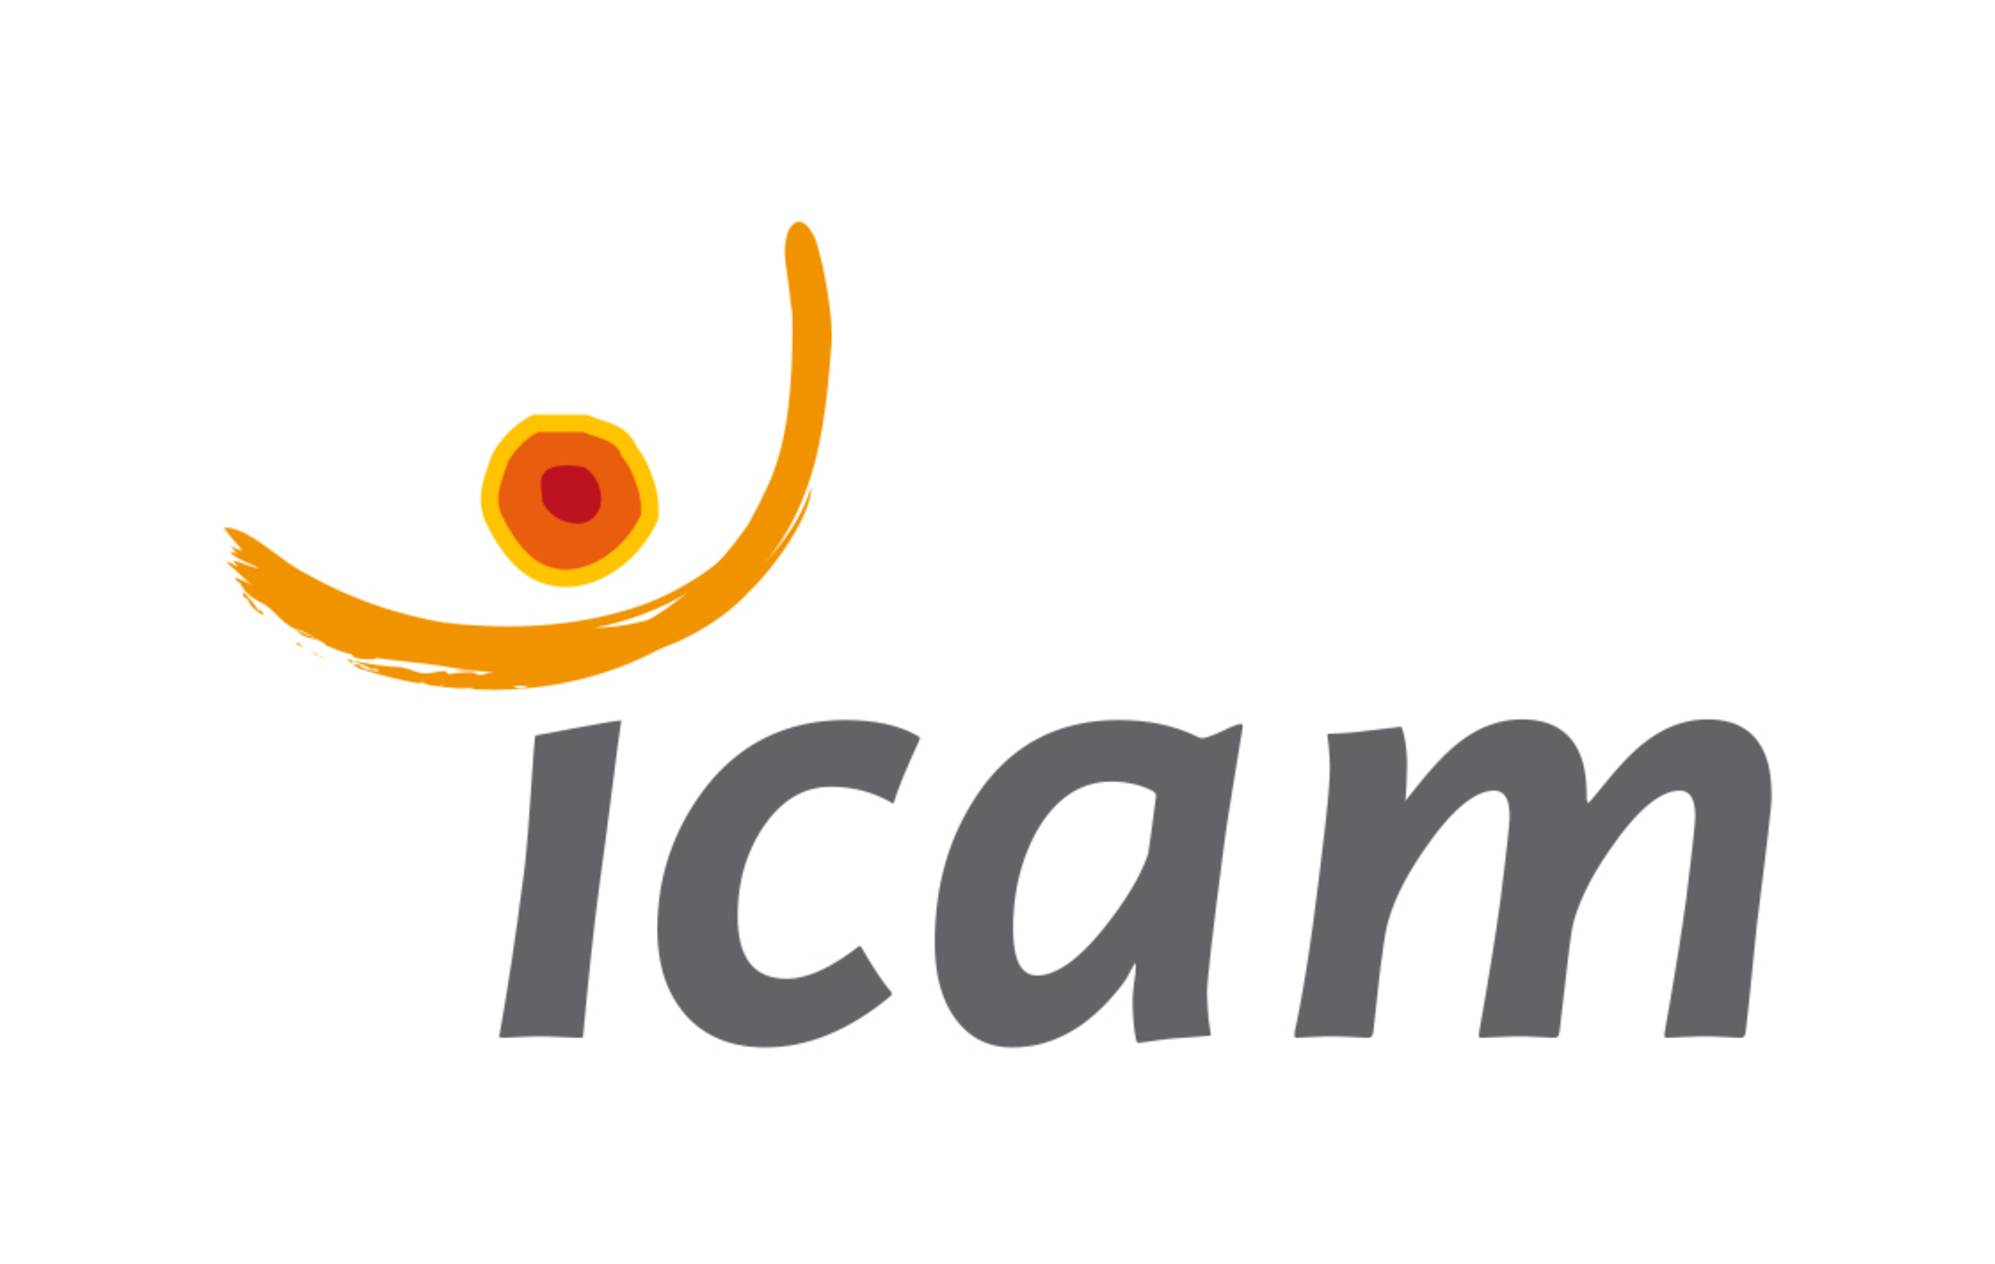 Institut catholique d'arts et métiers - ICAM